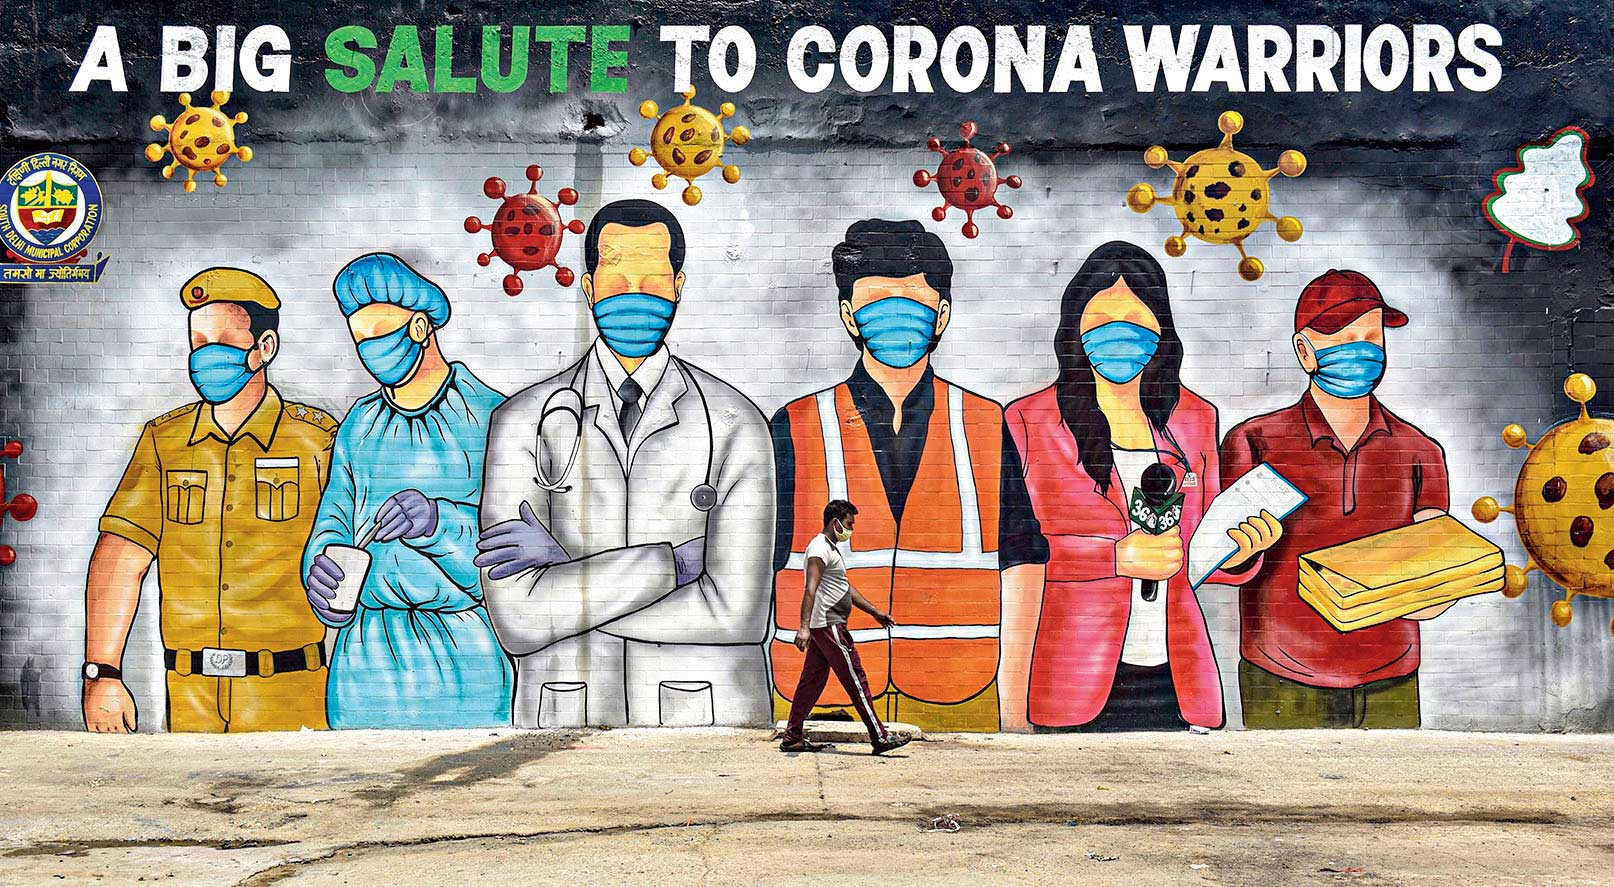 Graffiti on a Delhi wall saluting coronavirus warriors.